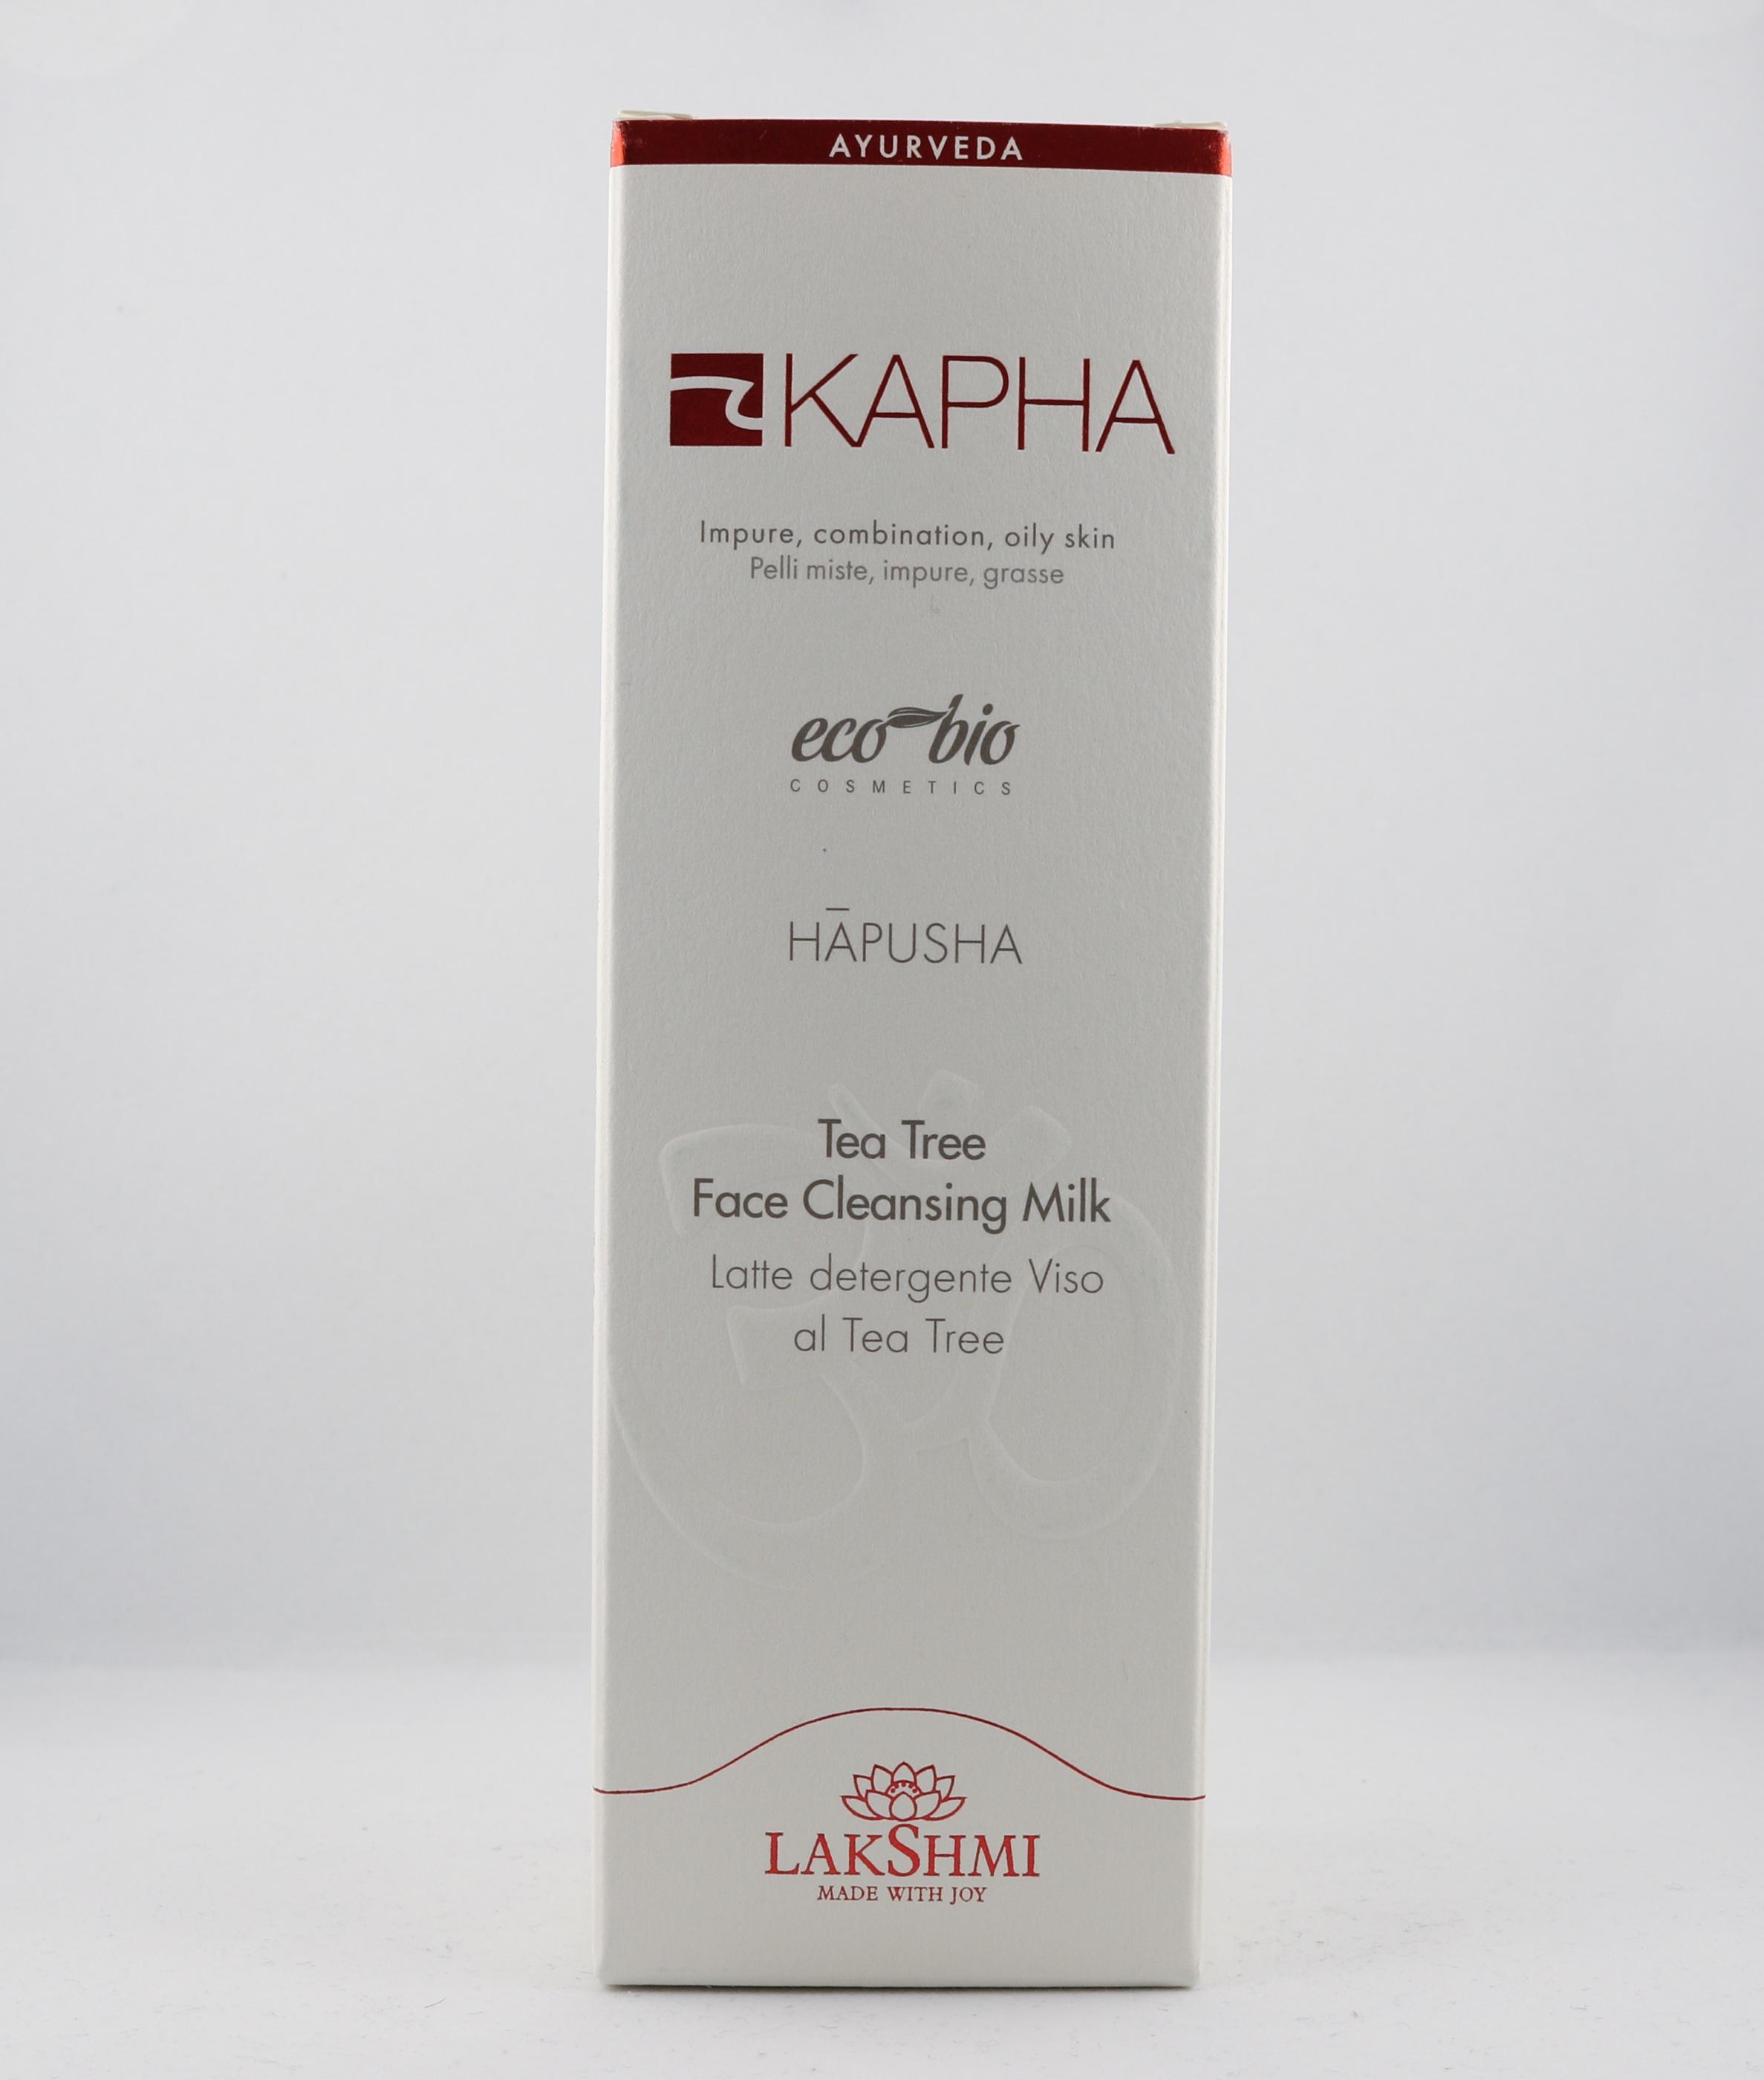 Kapha Tea Tree Face Cleansing Milk wellness ayurveda halmstad sweden svensk hudvård